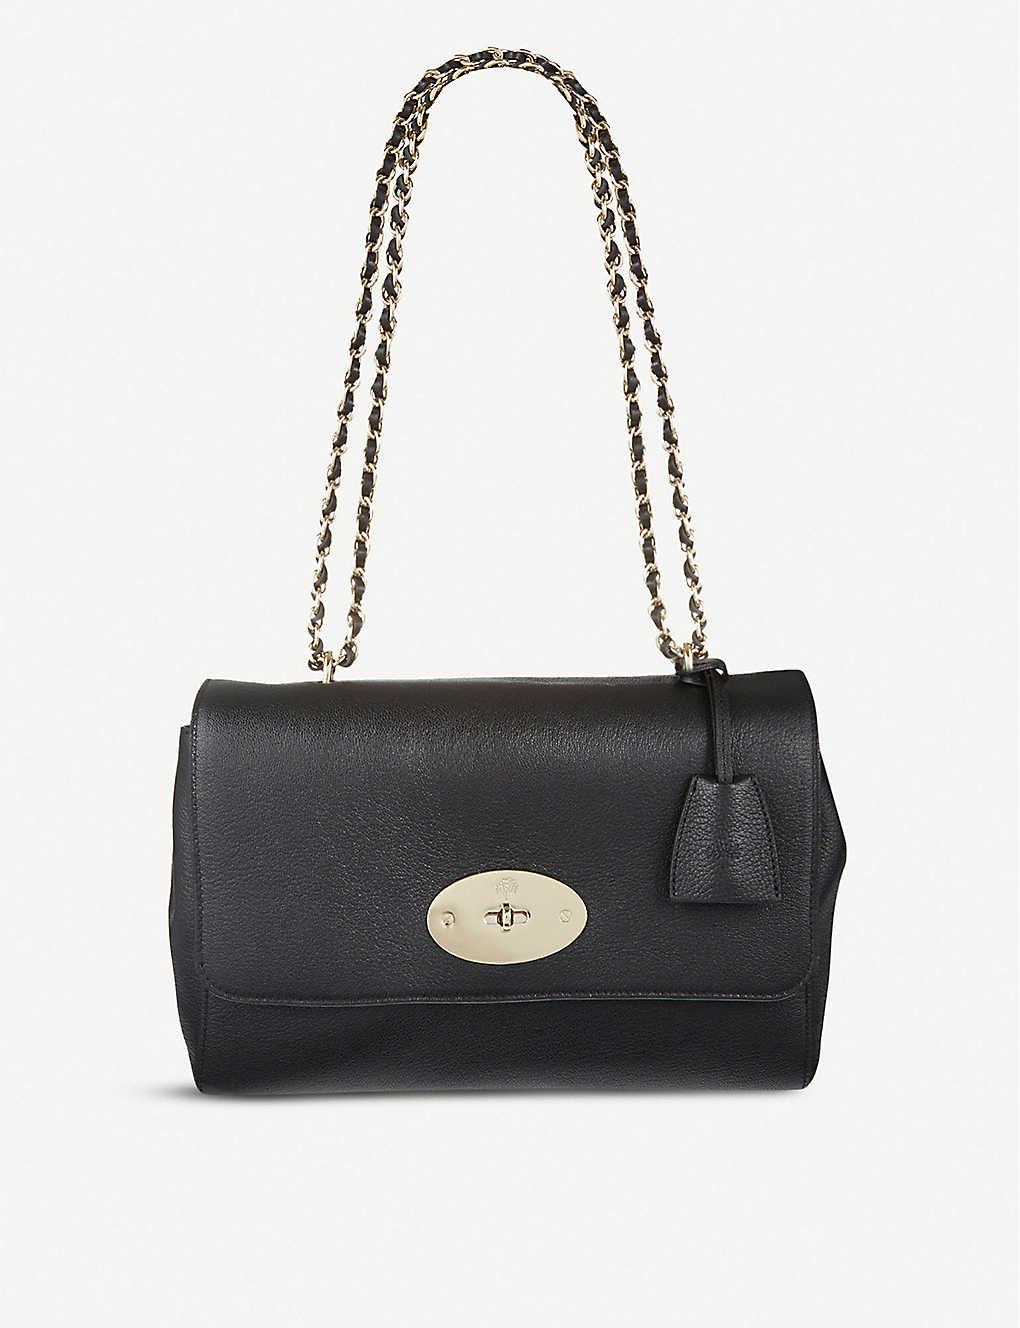 MULBERRY - Lily medium leather shoulder bag  7e2b9eab78555